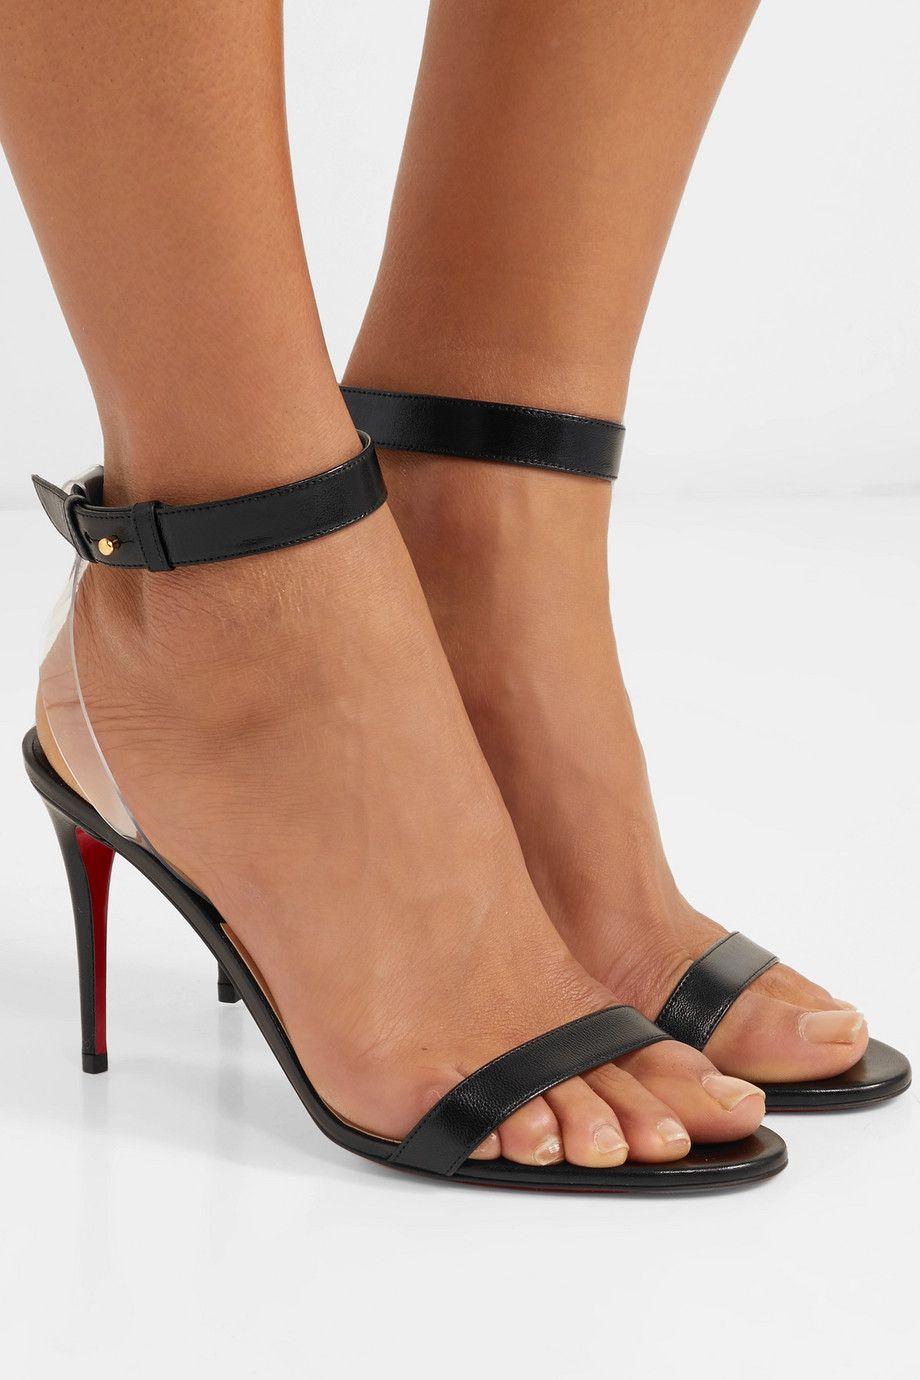 ad48557c6bb Christian Louboutin | Jonatina 85 PVC-trimmed leather sandals | NET ...